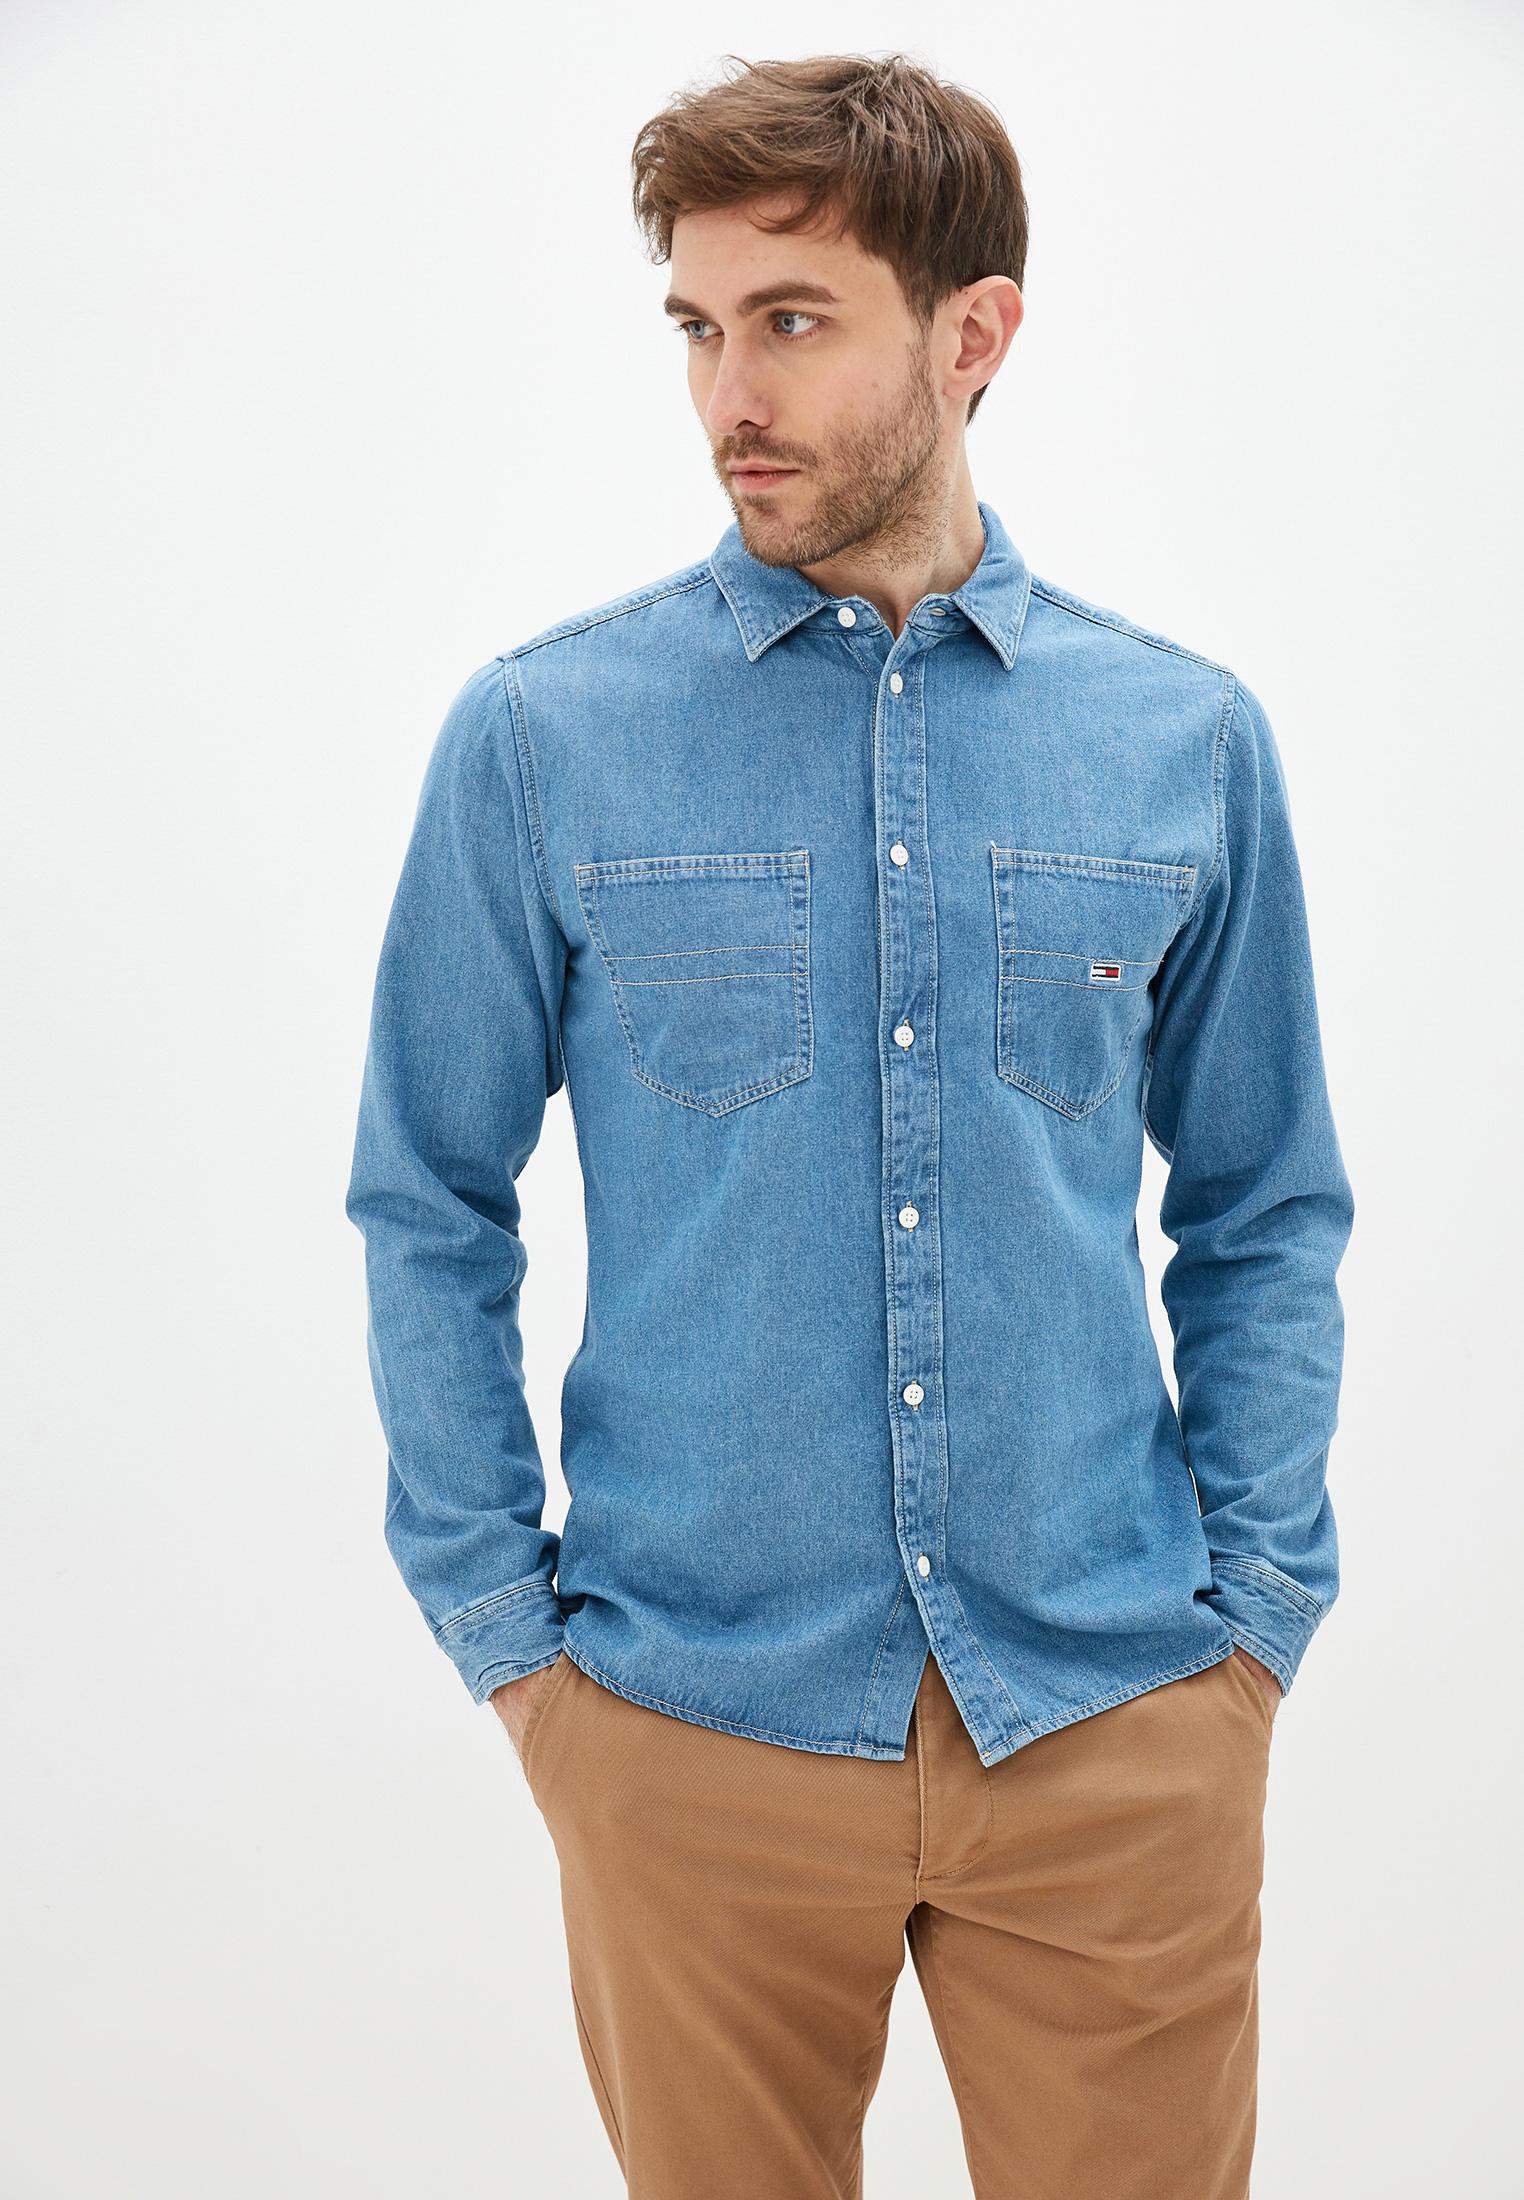 картинки рубашек и джинсов пао